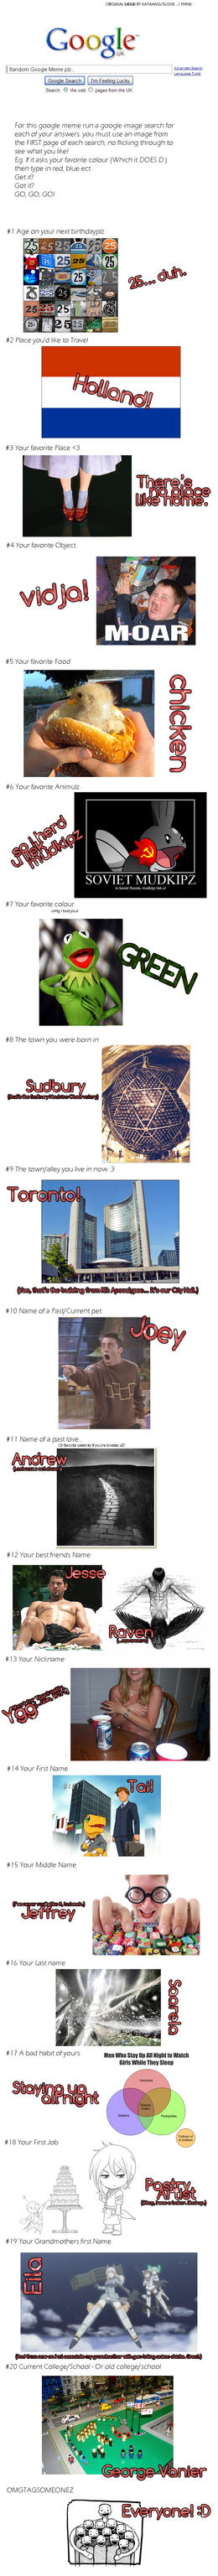 Random Google Meme by Yggdrasilly